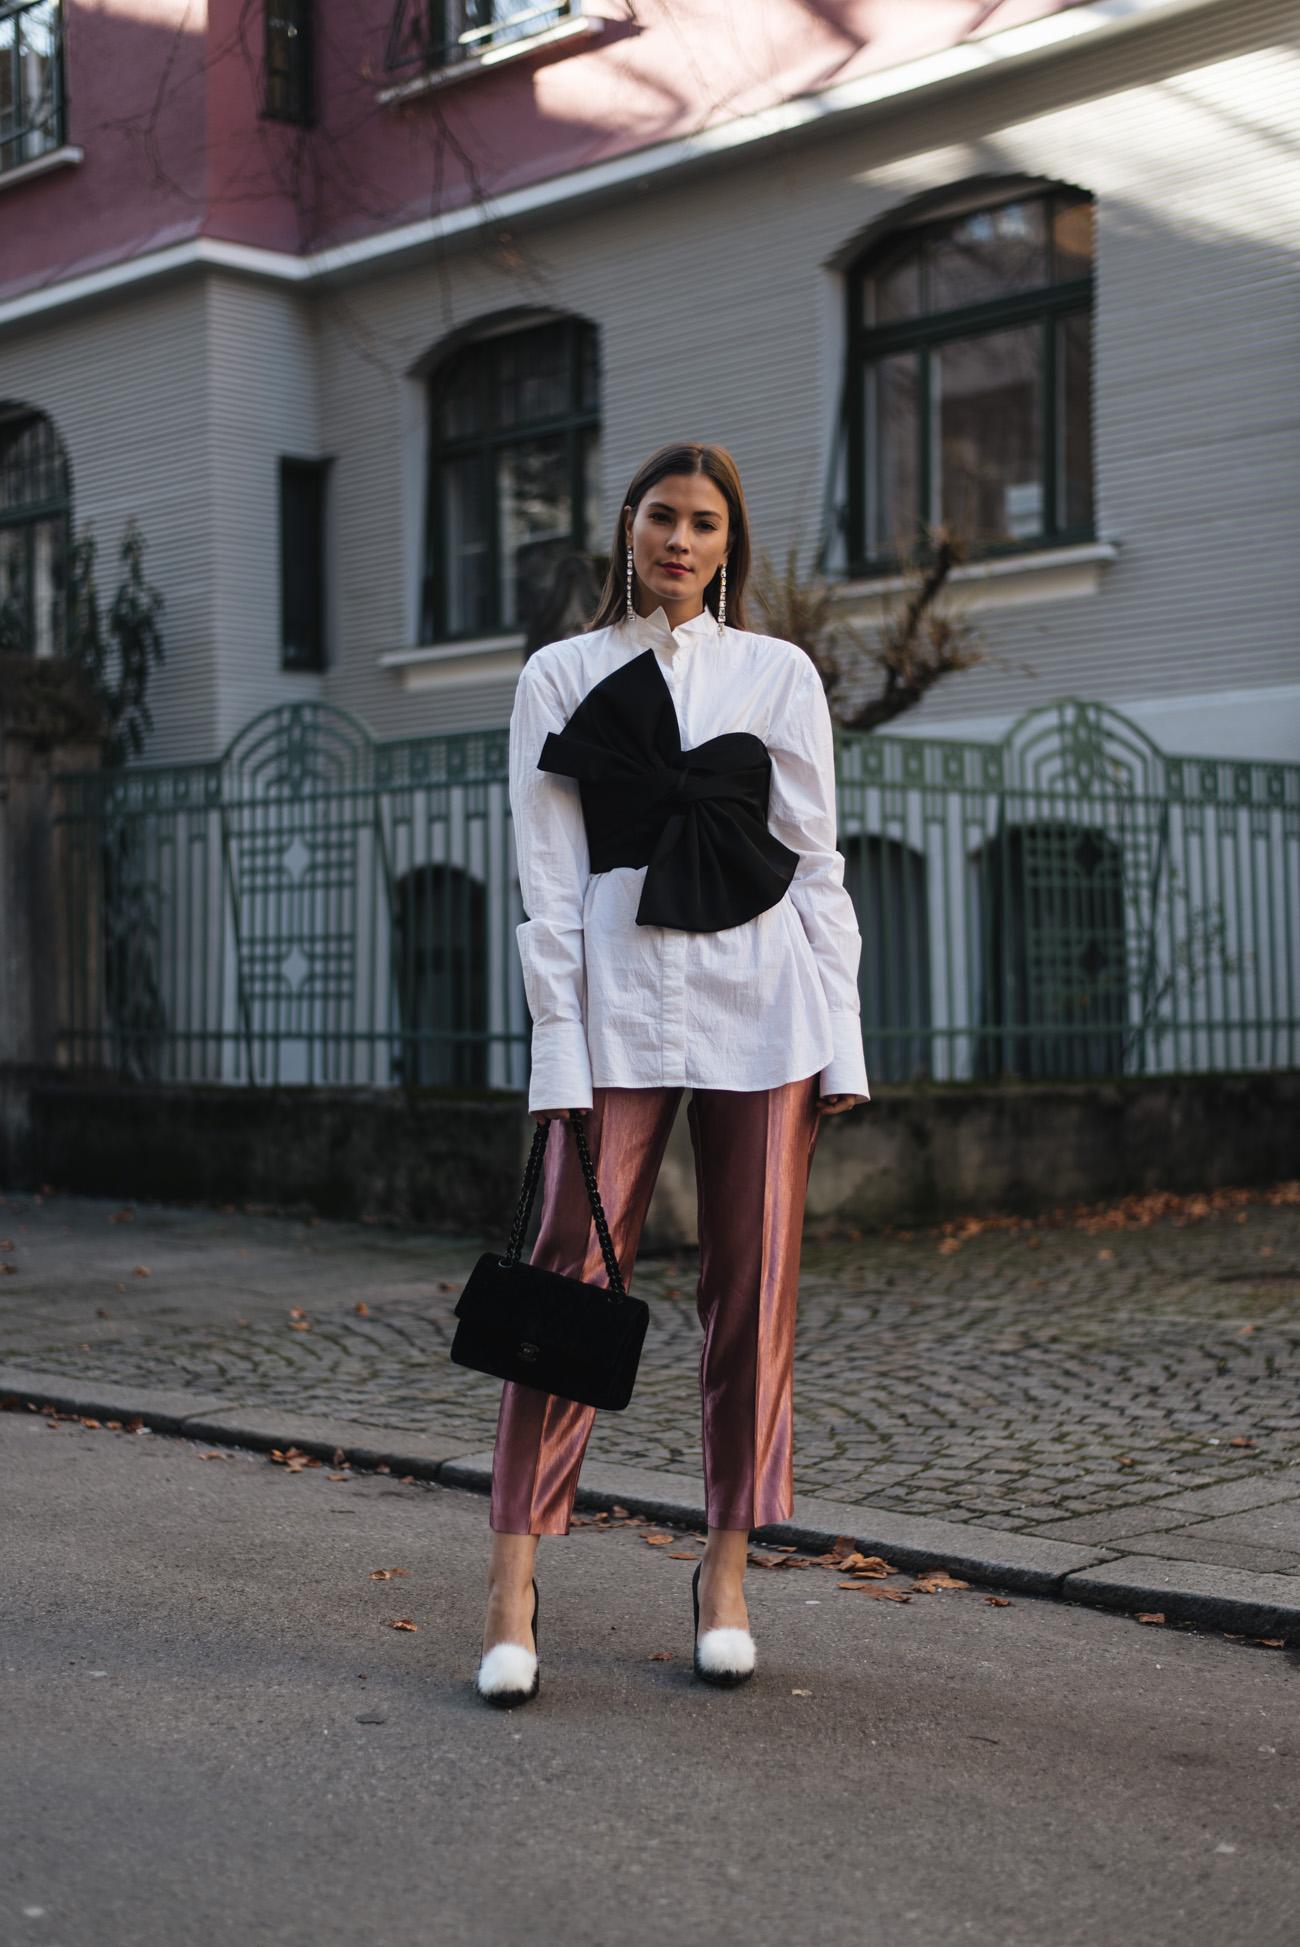 german-fashion-beauty-lifesyle-blogger-influencer-high-end-luxury-nina-schwichtenberg-fashiioncarpet-